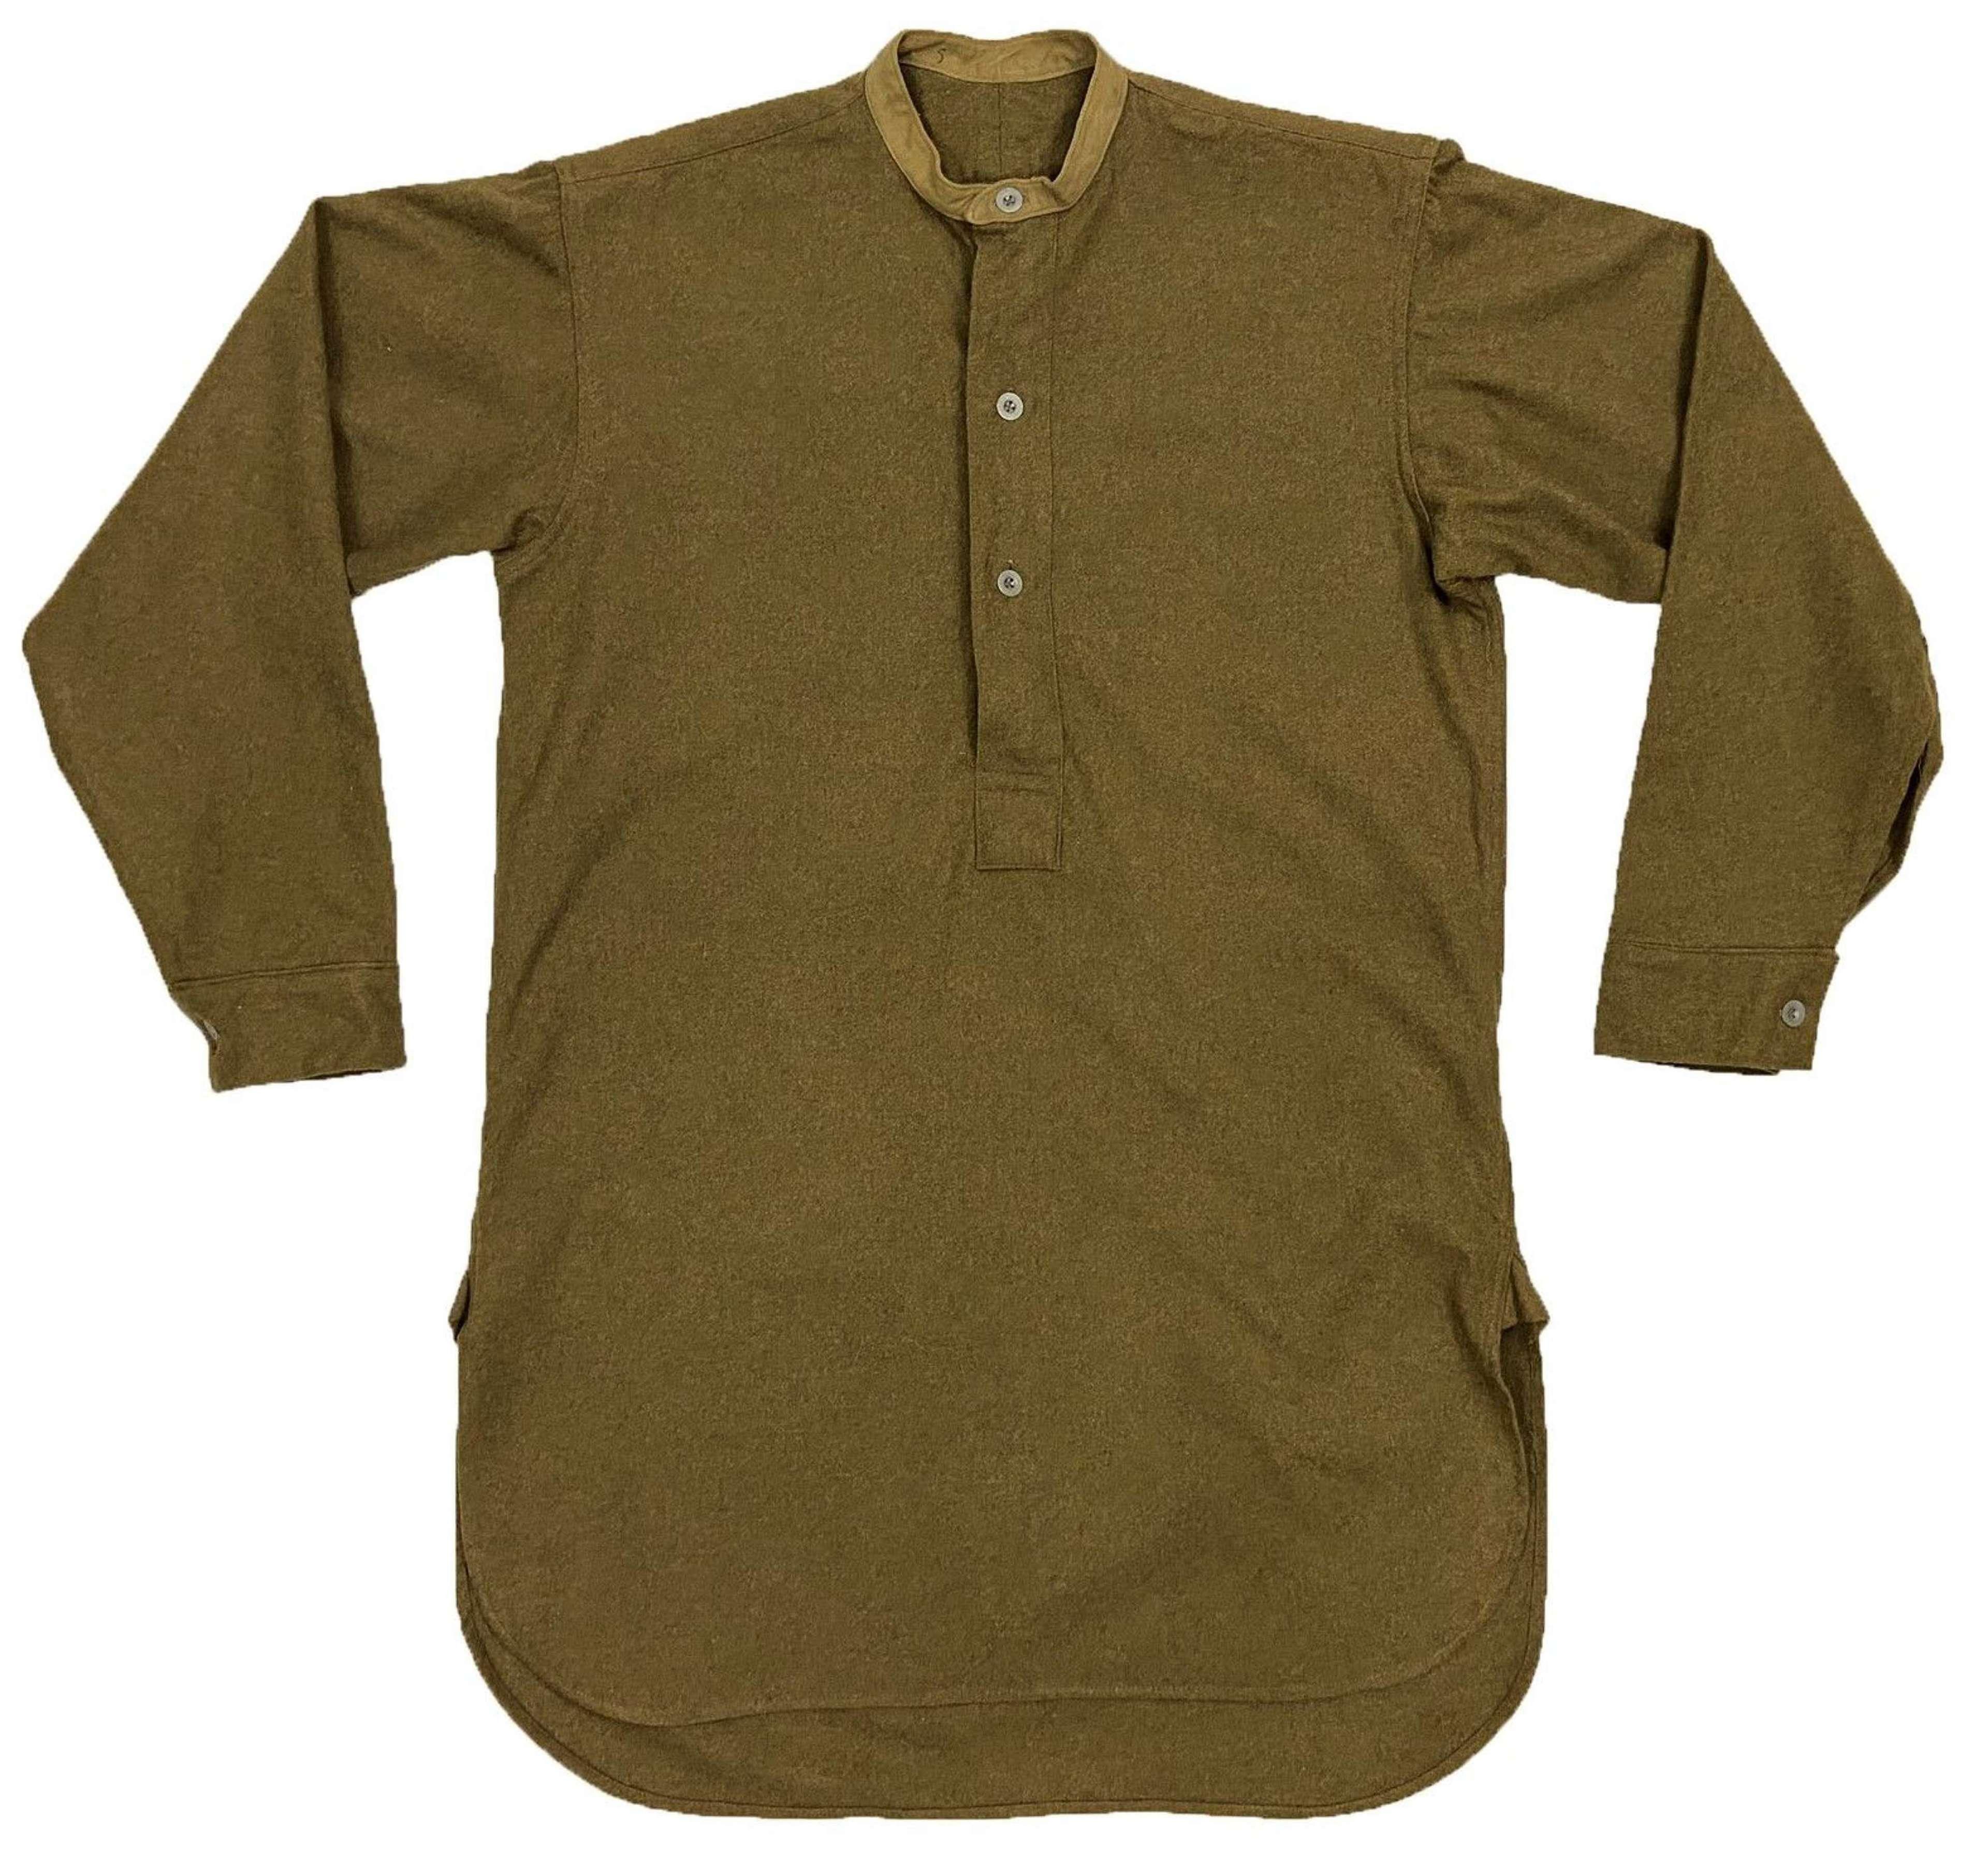 Scarce Original Early WW2 British Army Ordinary Ranks Collarless Shirt